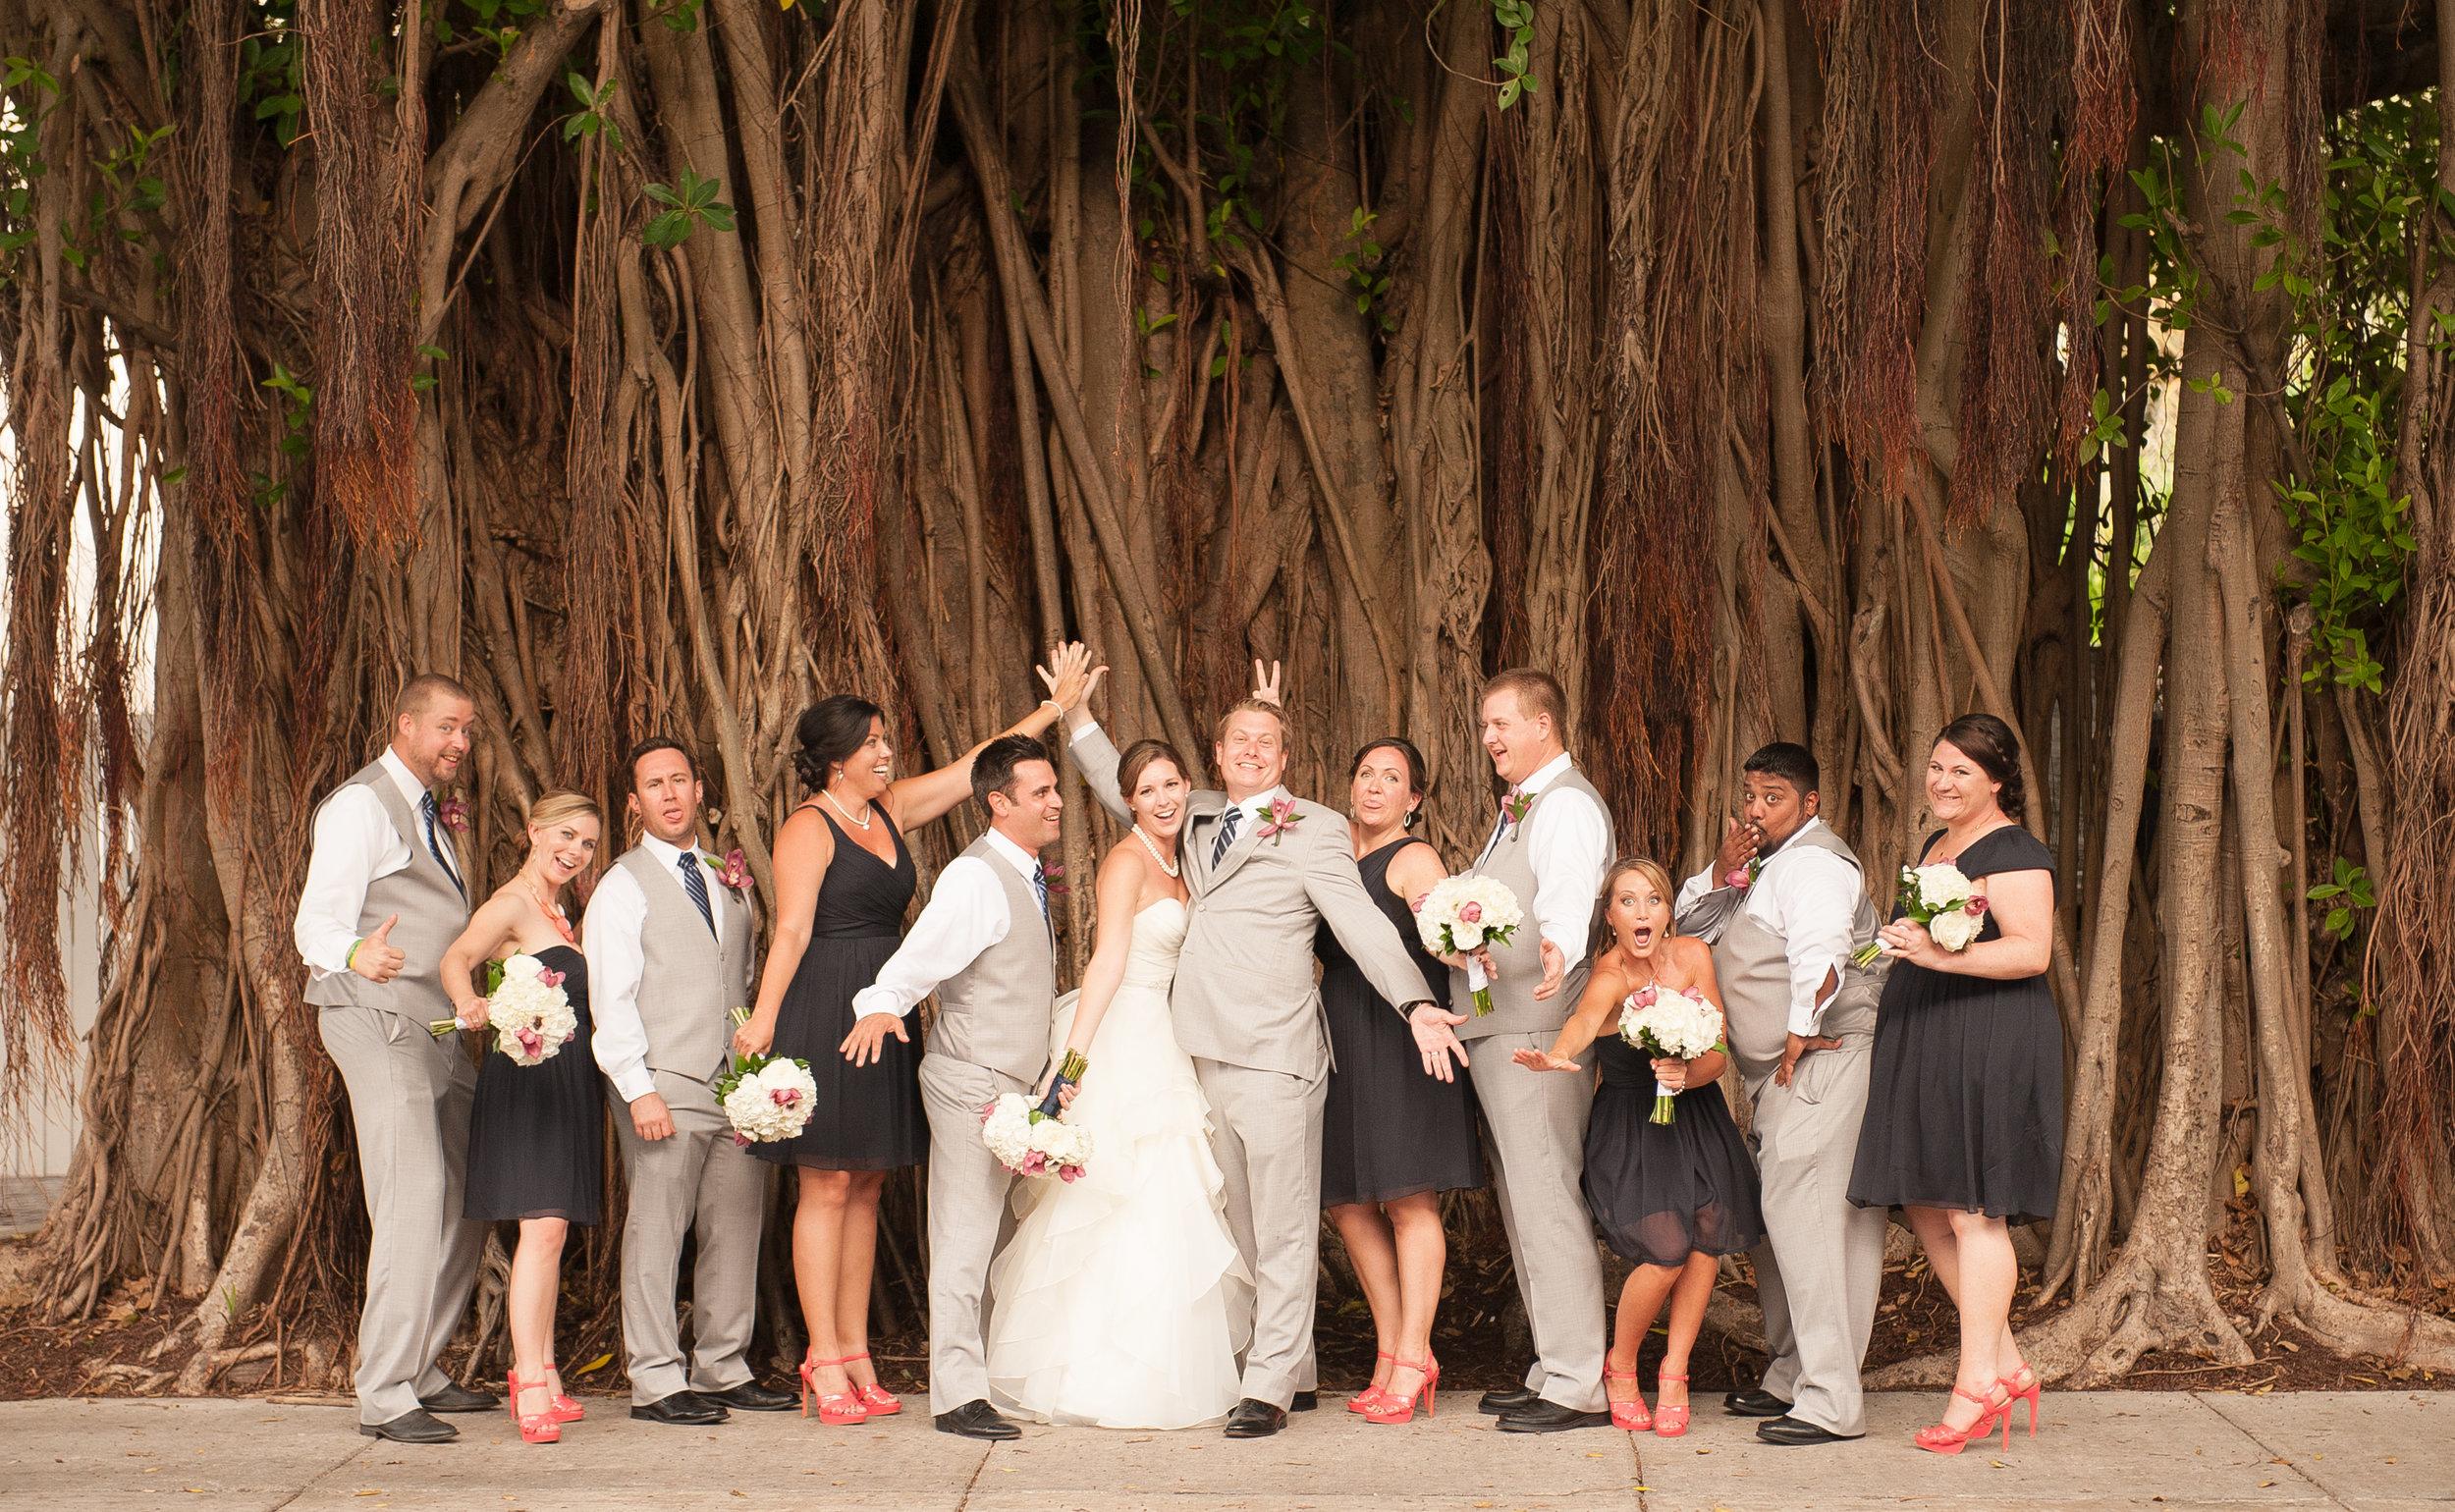 Amanda+James_Audubon House Key West Wedding23.jpg